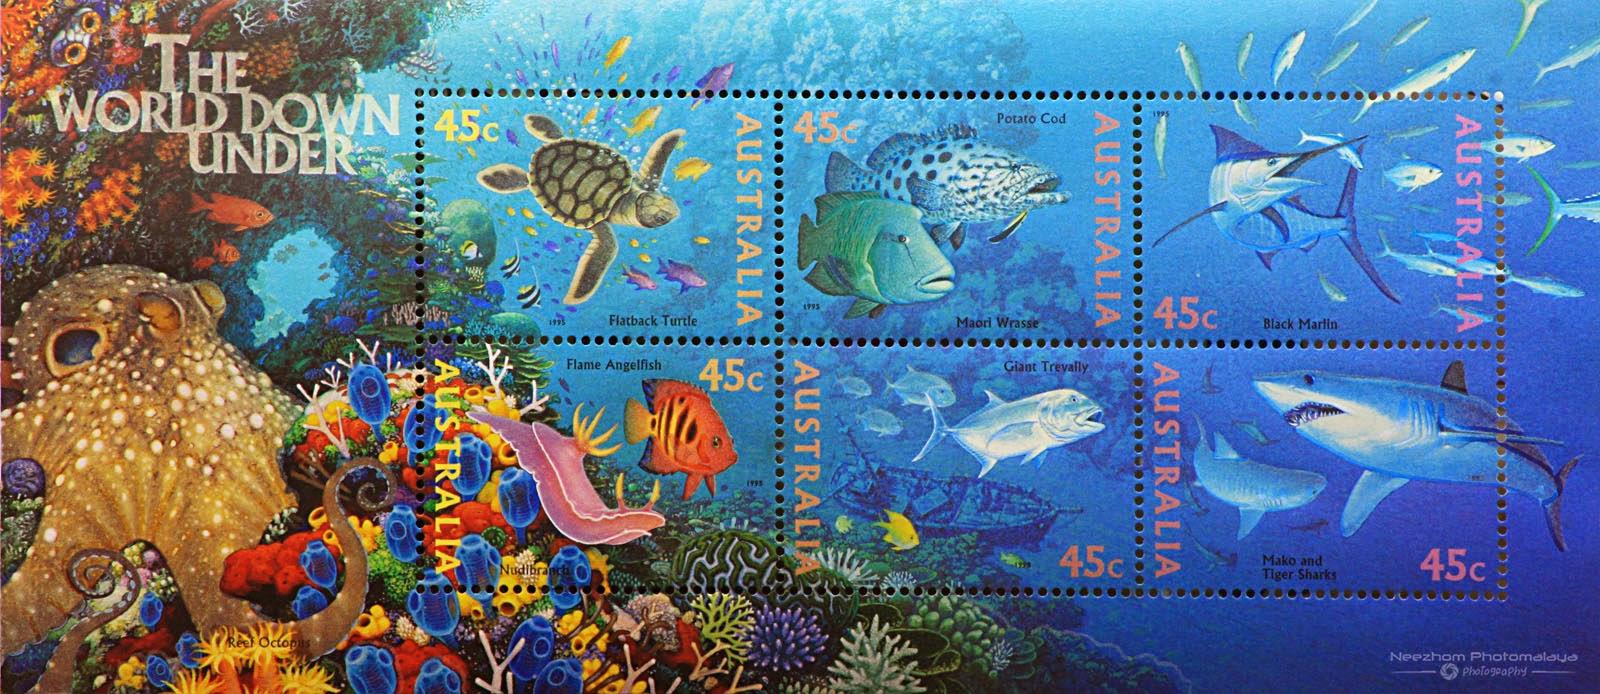 Australia 1995 The World Down Under miniature sheet